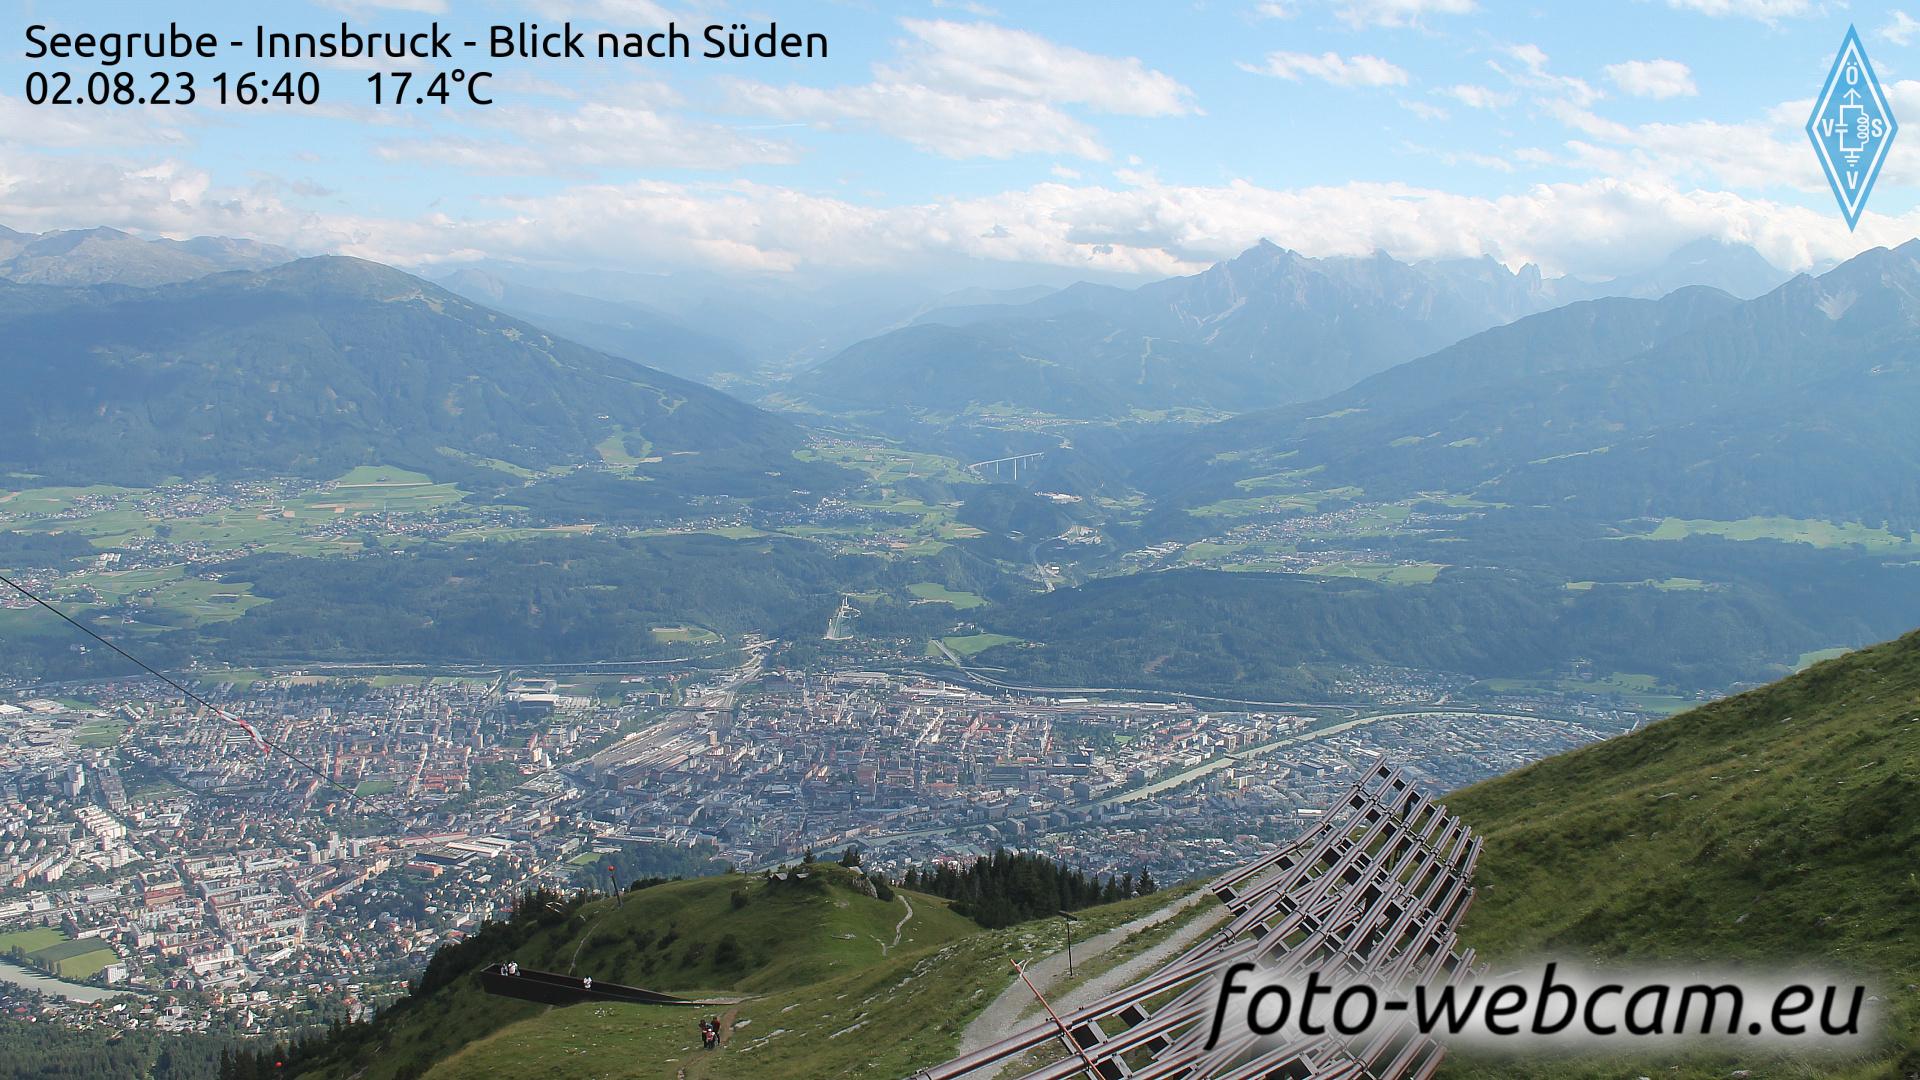 Innsbruck Wed. 16:18